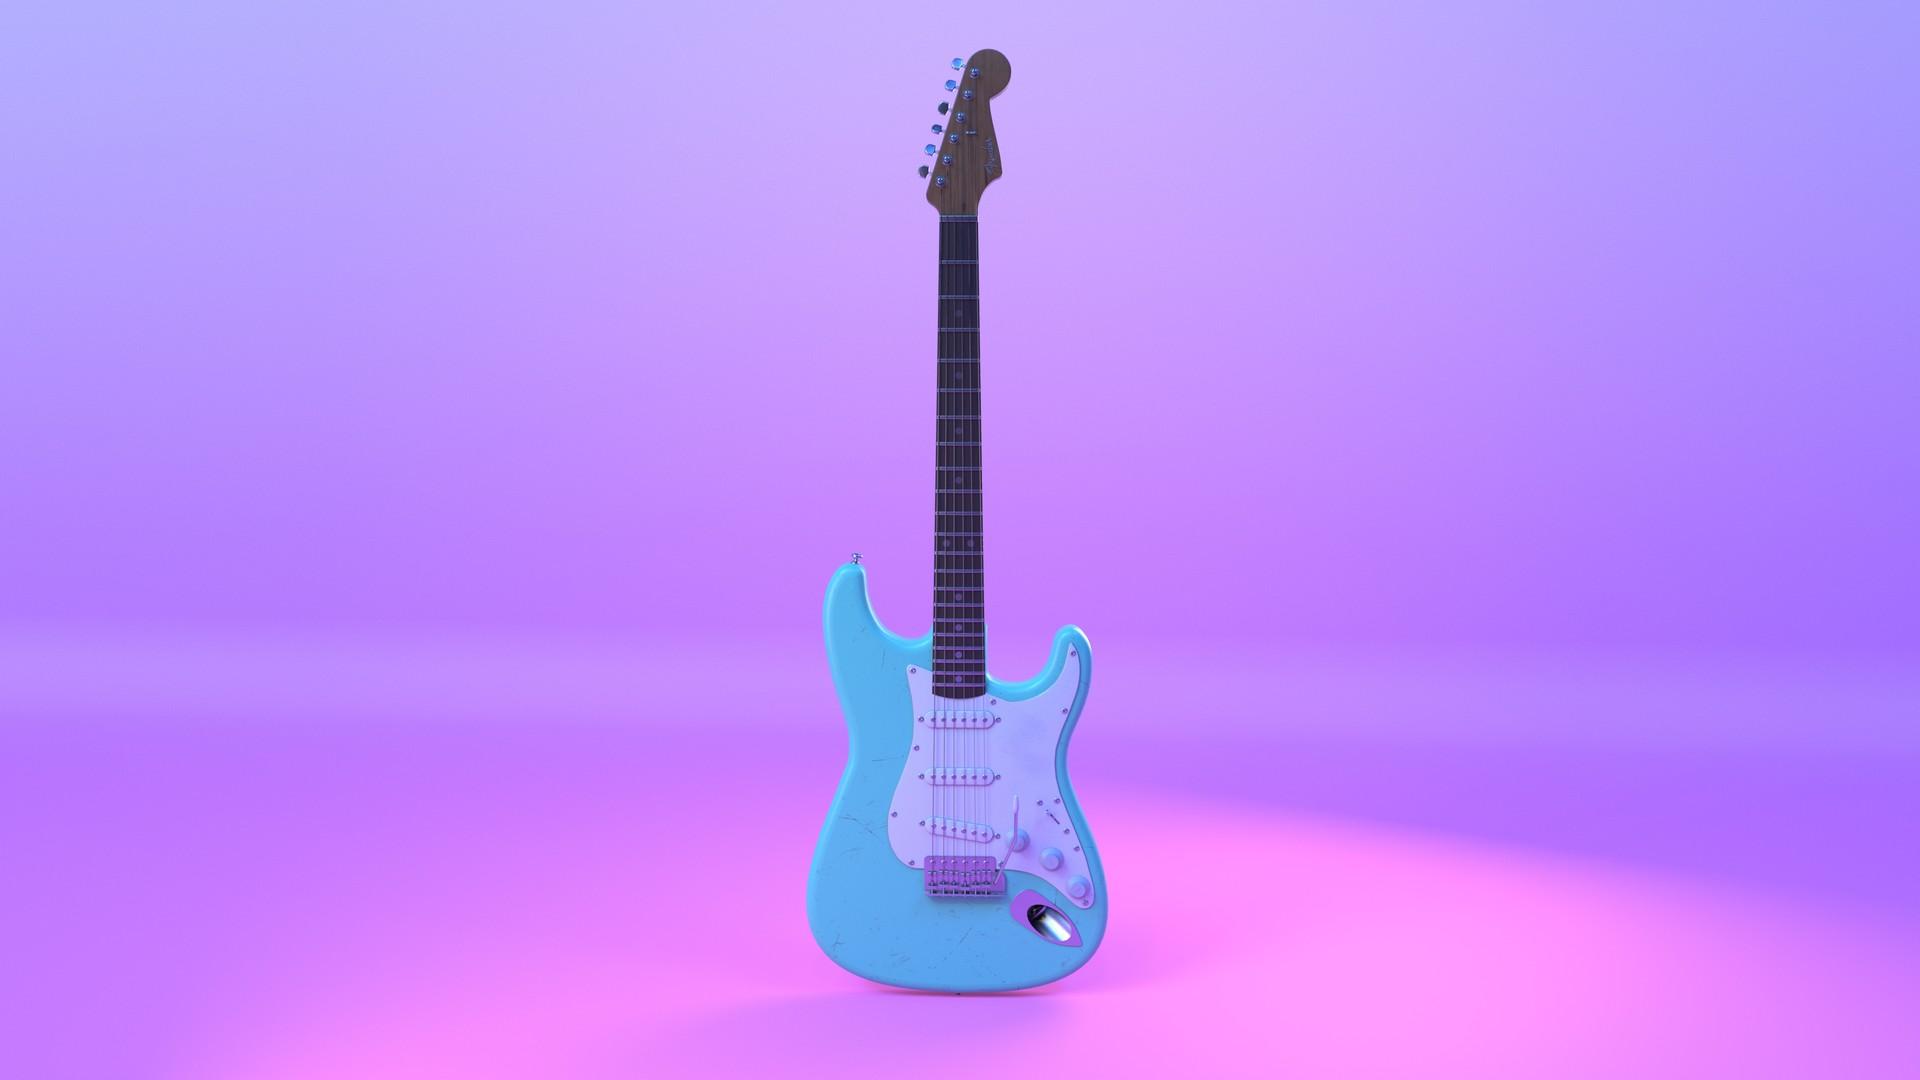 Andrew moore guitar front 4k